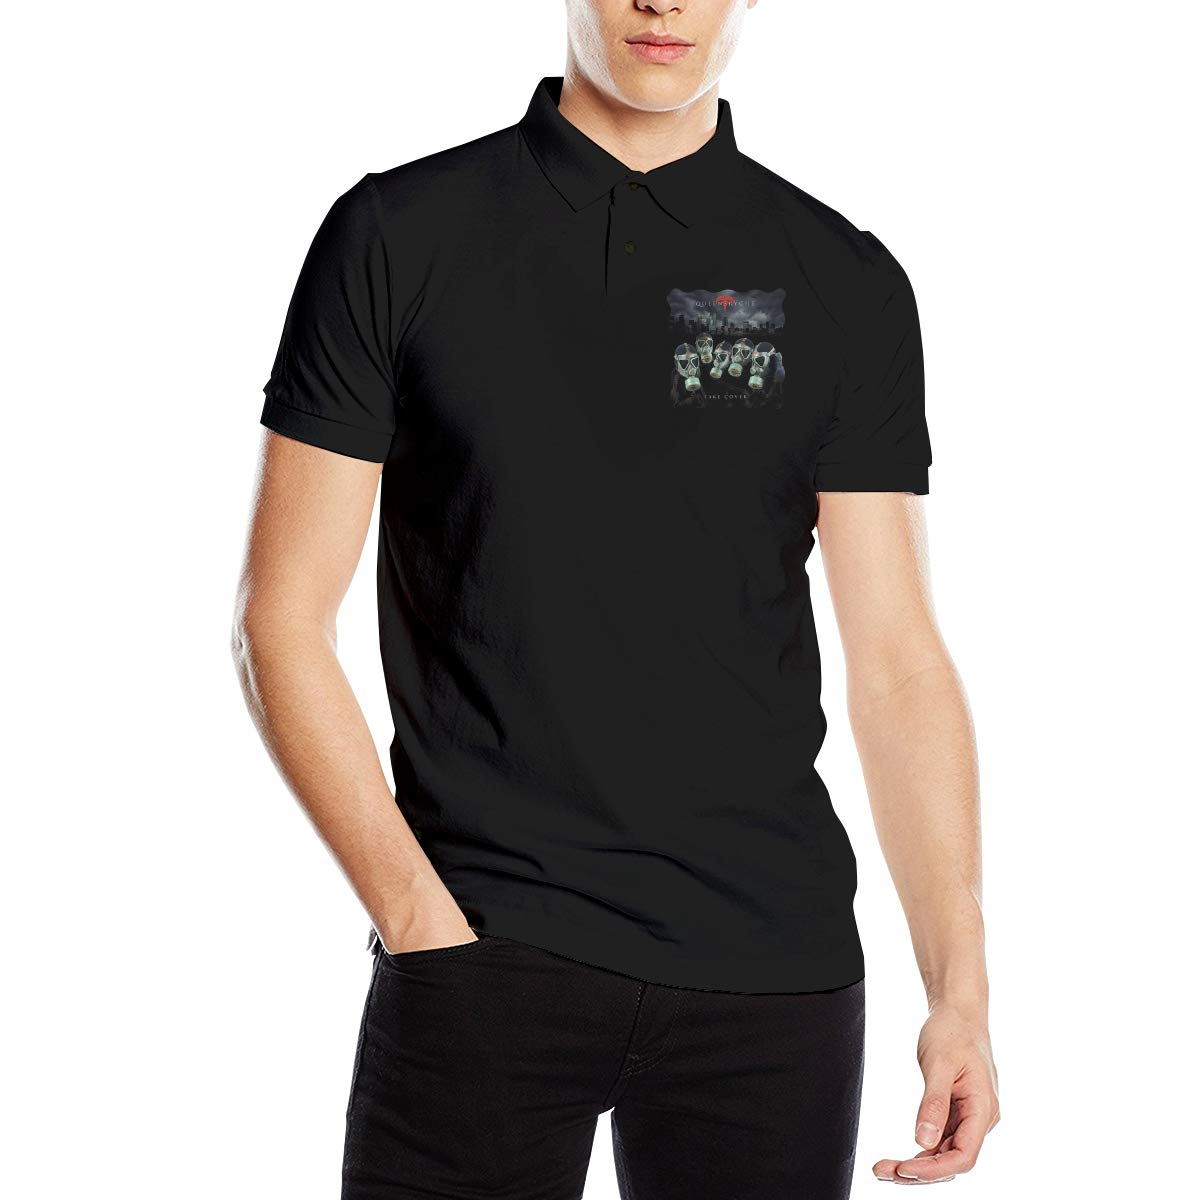 Cjlrqone Queensryche Mens Leisure Polo Shirts Black